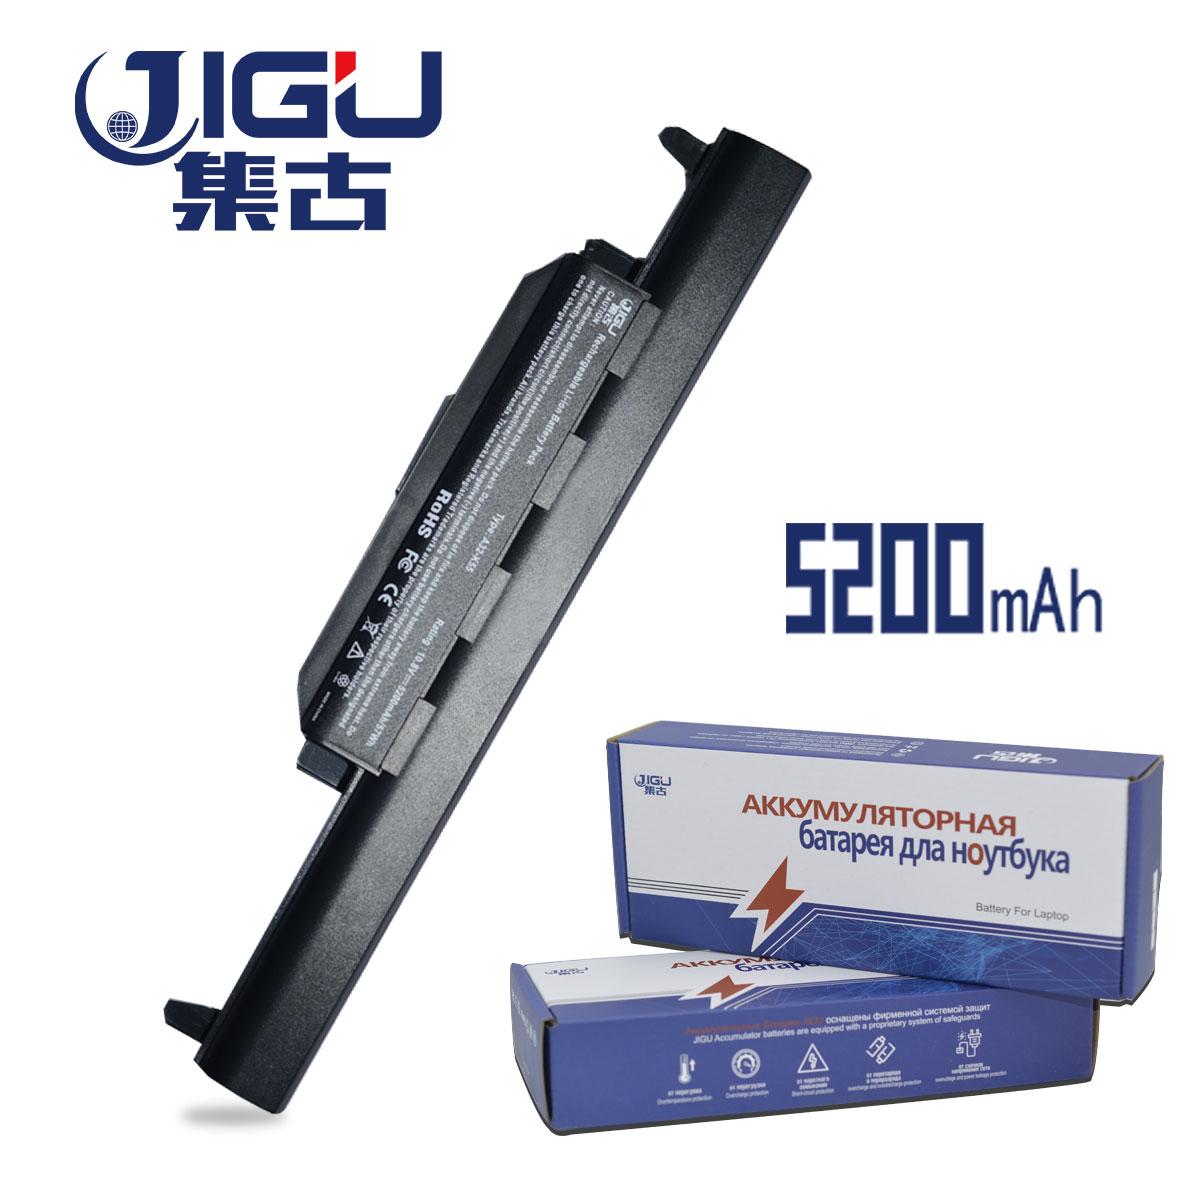 JIGU Laptop Battery For ASUS A55A A55D A55DE A55DR A55N A55VD A55VM A55VS A55A-SX060V A55VD-SX043V A55VD-SX050V A55VD-SX054V